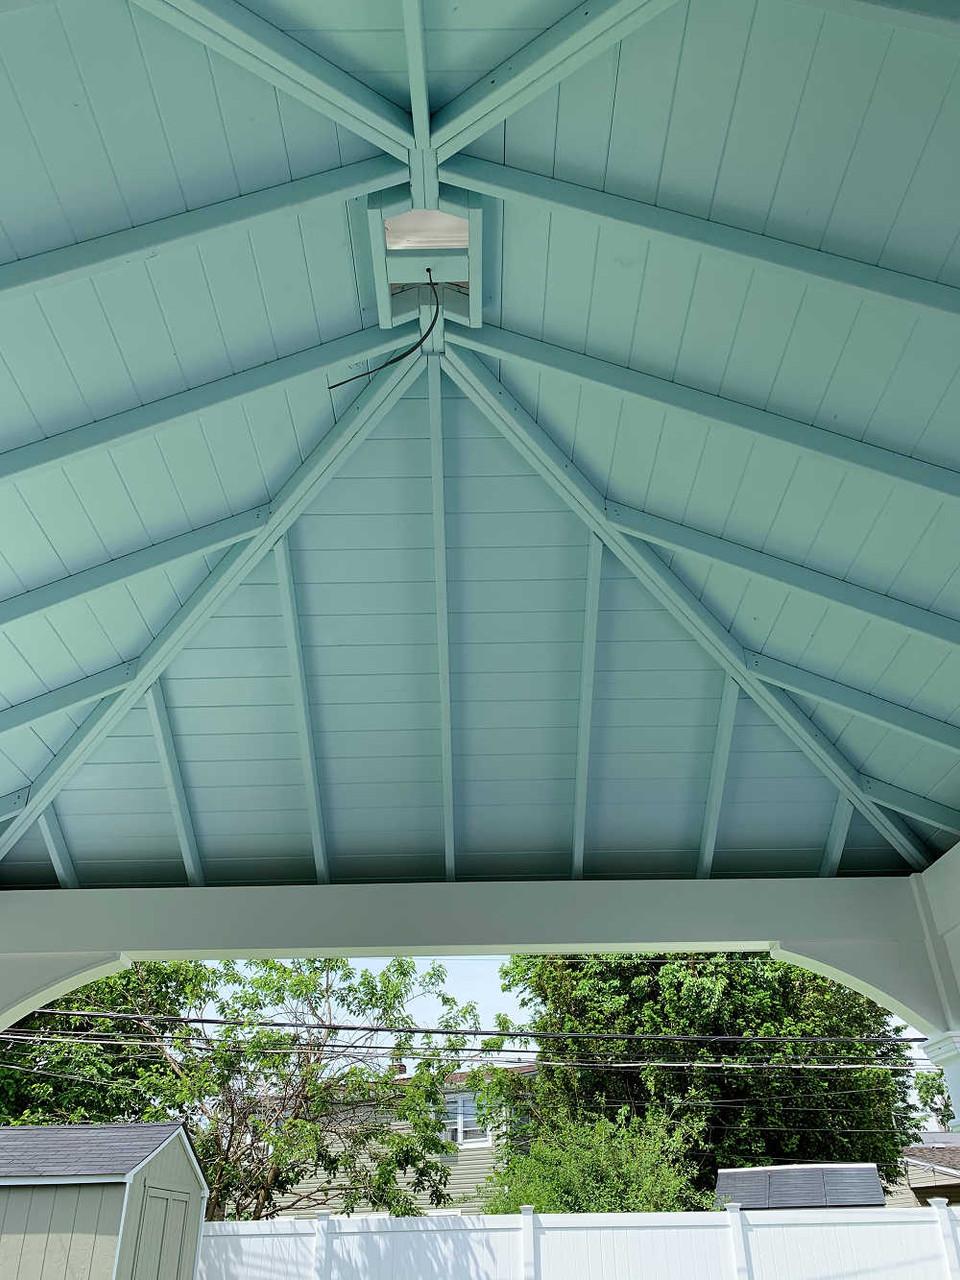 Interior ceiling painted a custom color - Benjamin Moore Clear Skies